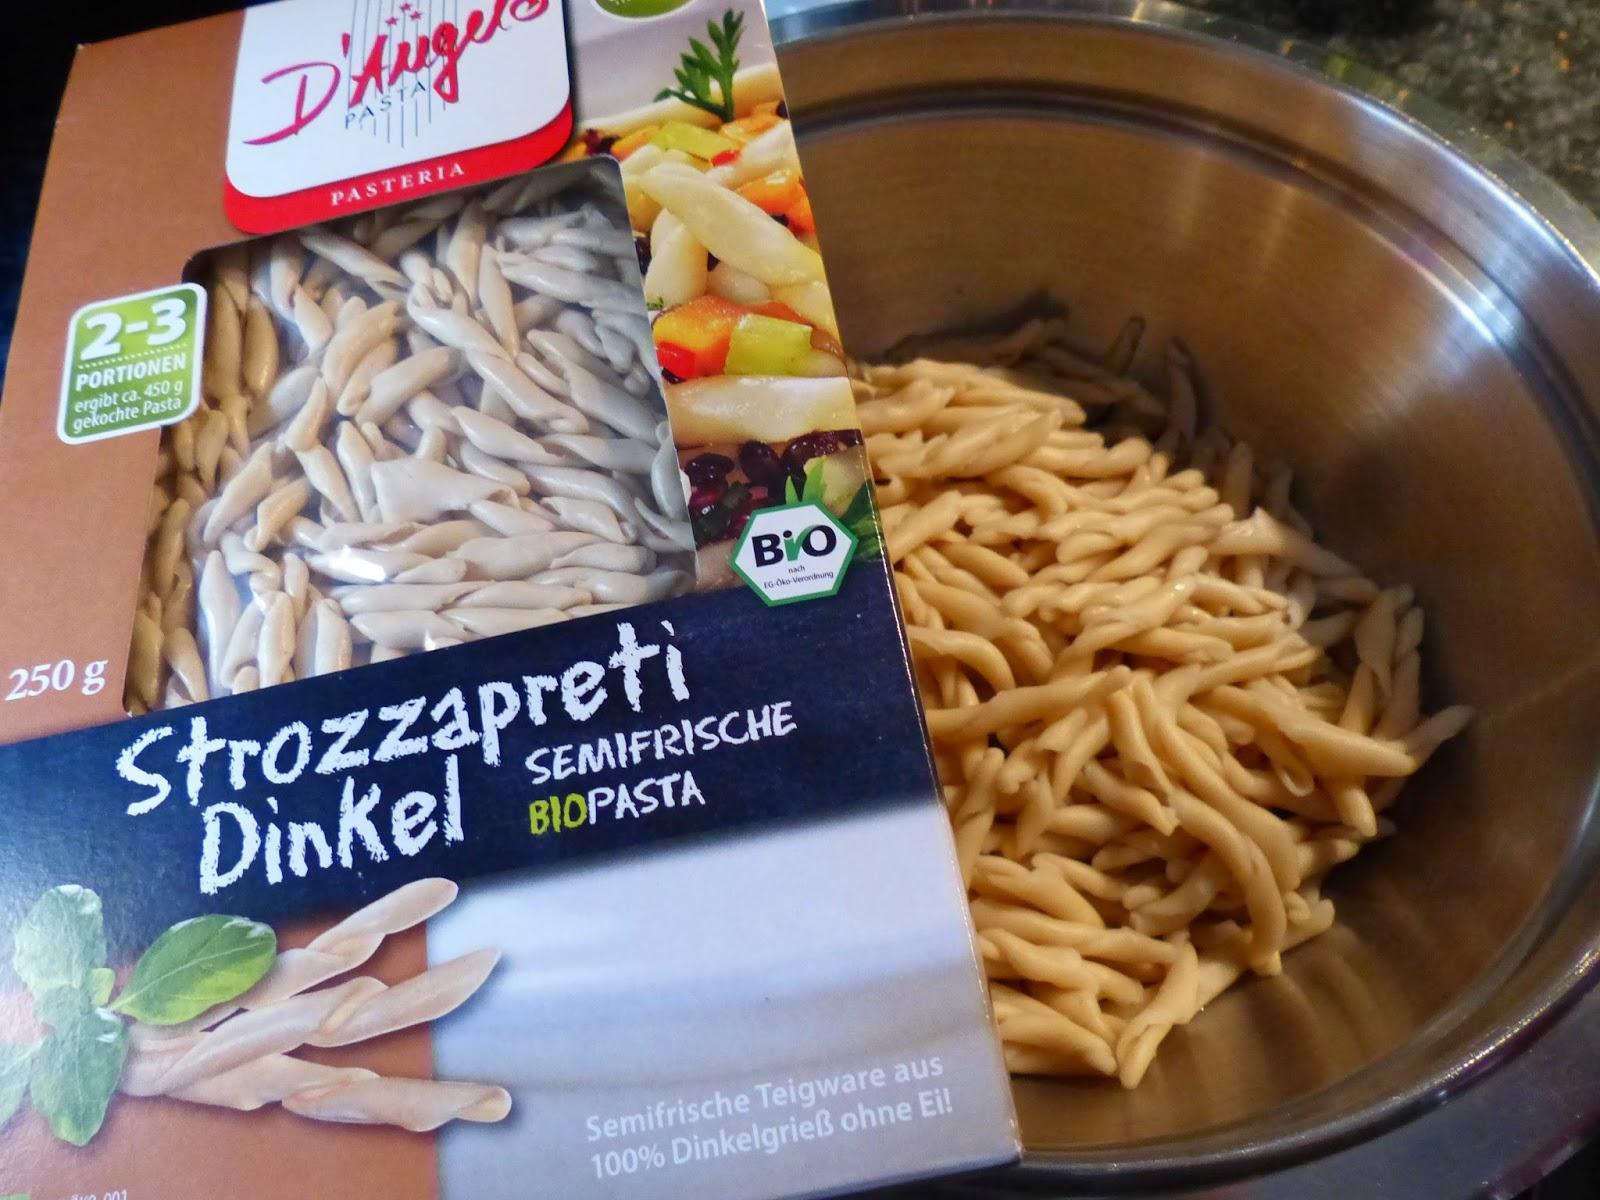 http://www.dangelo.de/marken-produkte/semifrischlinie.html